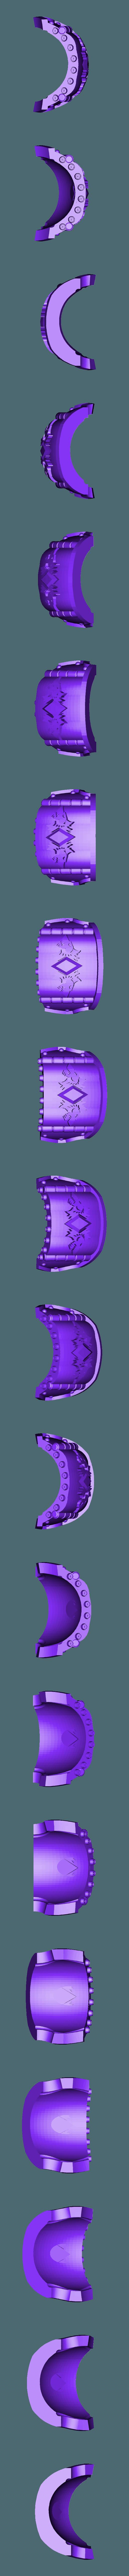 Praefecti_-_Wolf.stl Download free STL file Legion of the Wolf - Marine Upgrade Pack • 3D printer object, GarinC3D